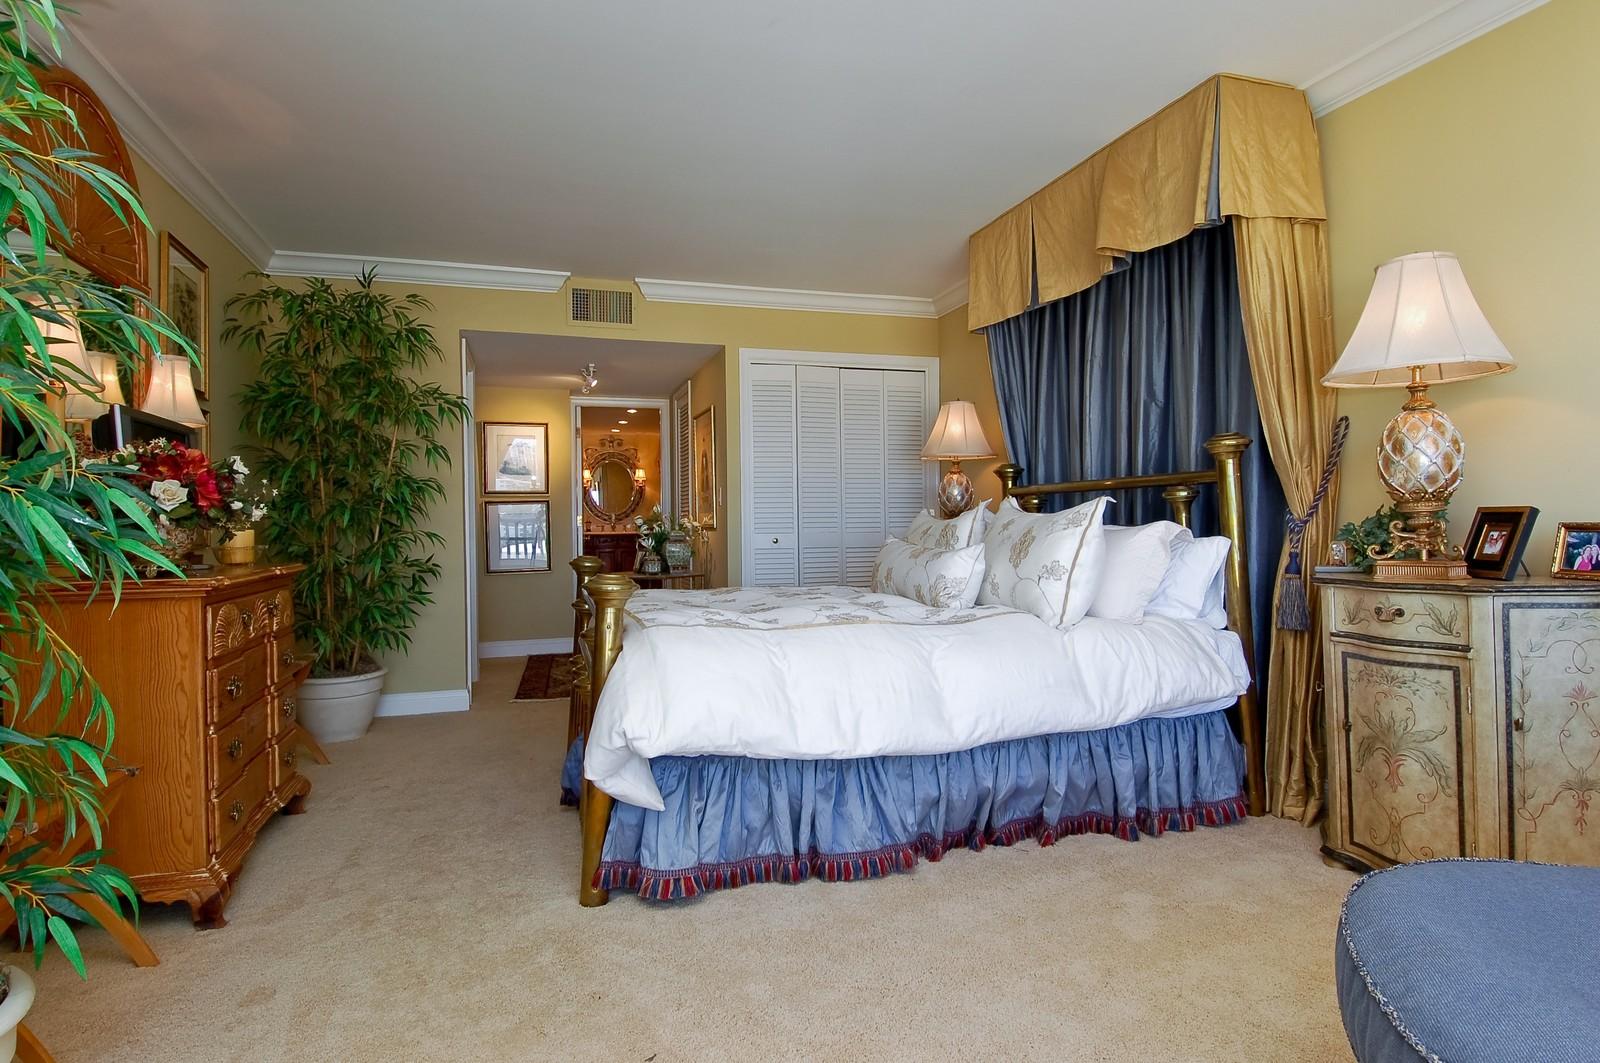 Real Estate Photography - 2200 S Ocean Ln, 1003, Fort Lauderdale, FL, 33316 - Master Bedroom